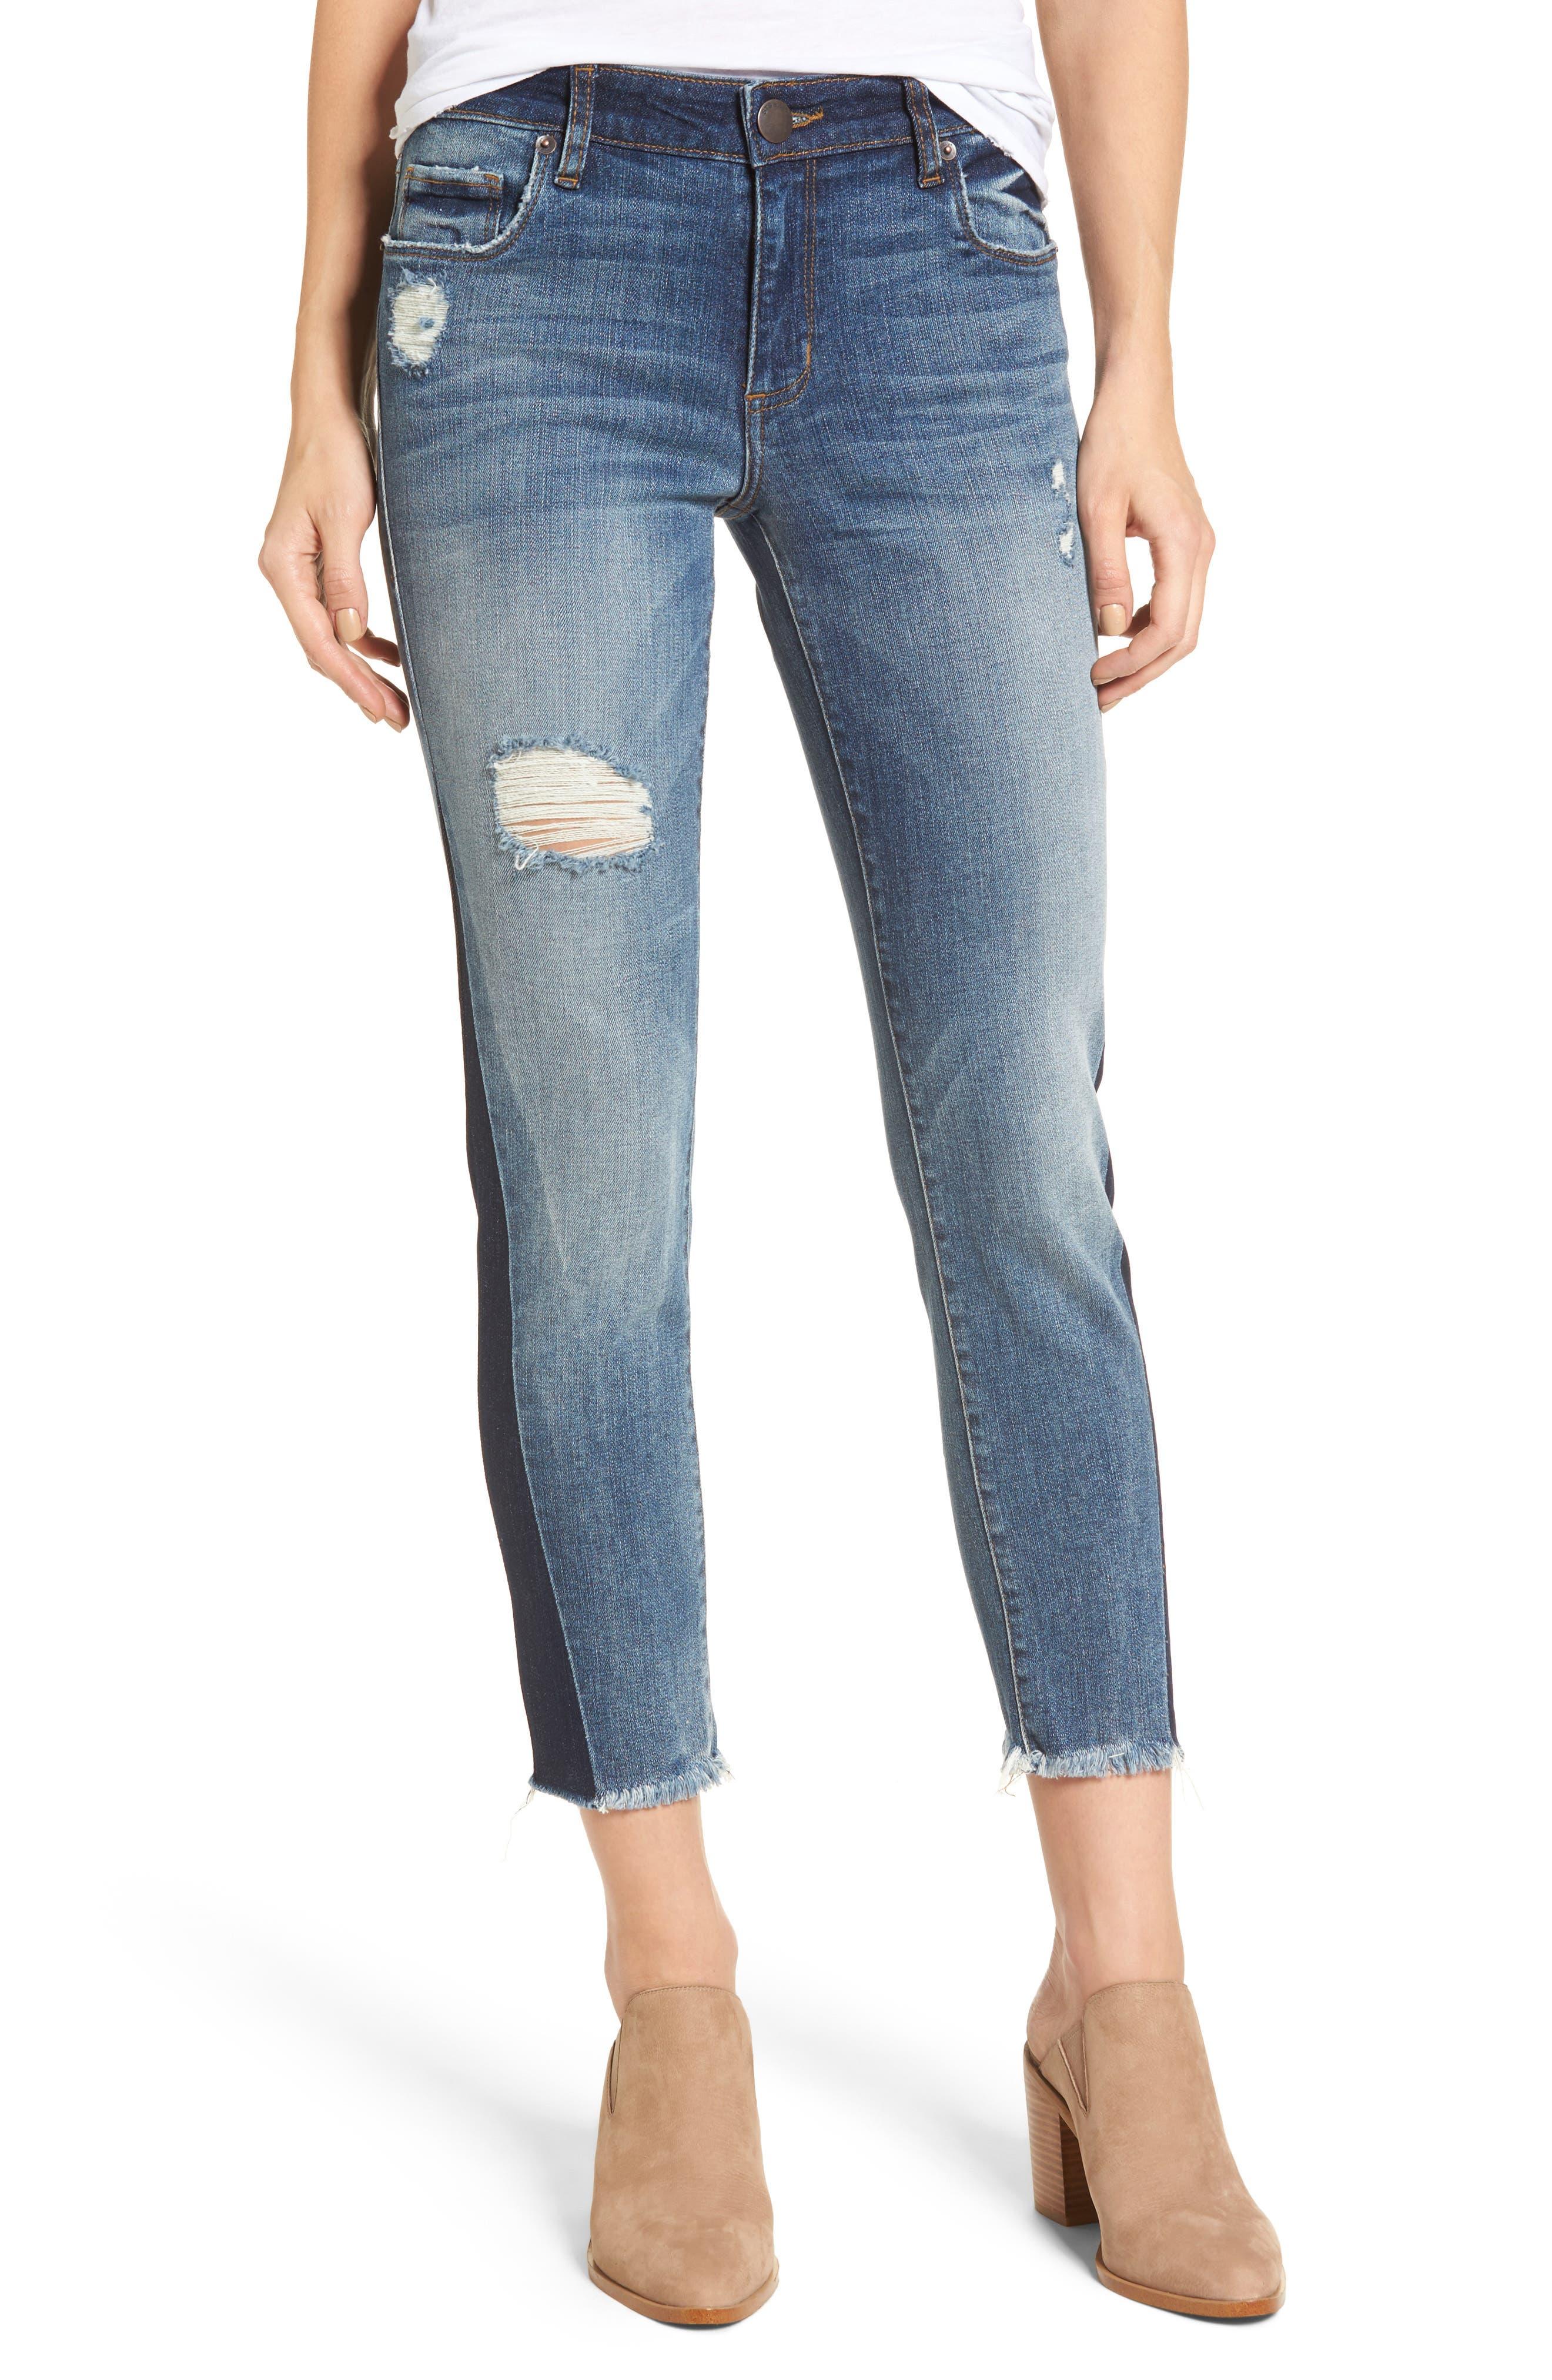 Taylor Colorblock Straight Leg Jeans,                         Main,                         color, Woodruff